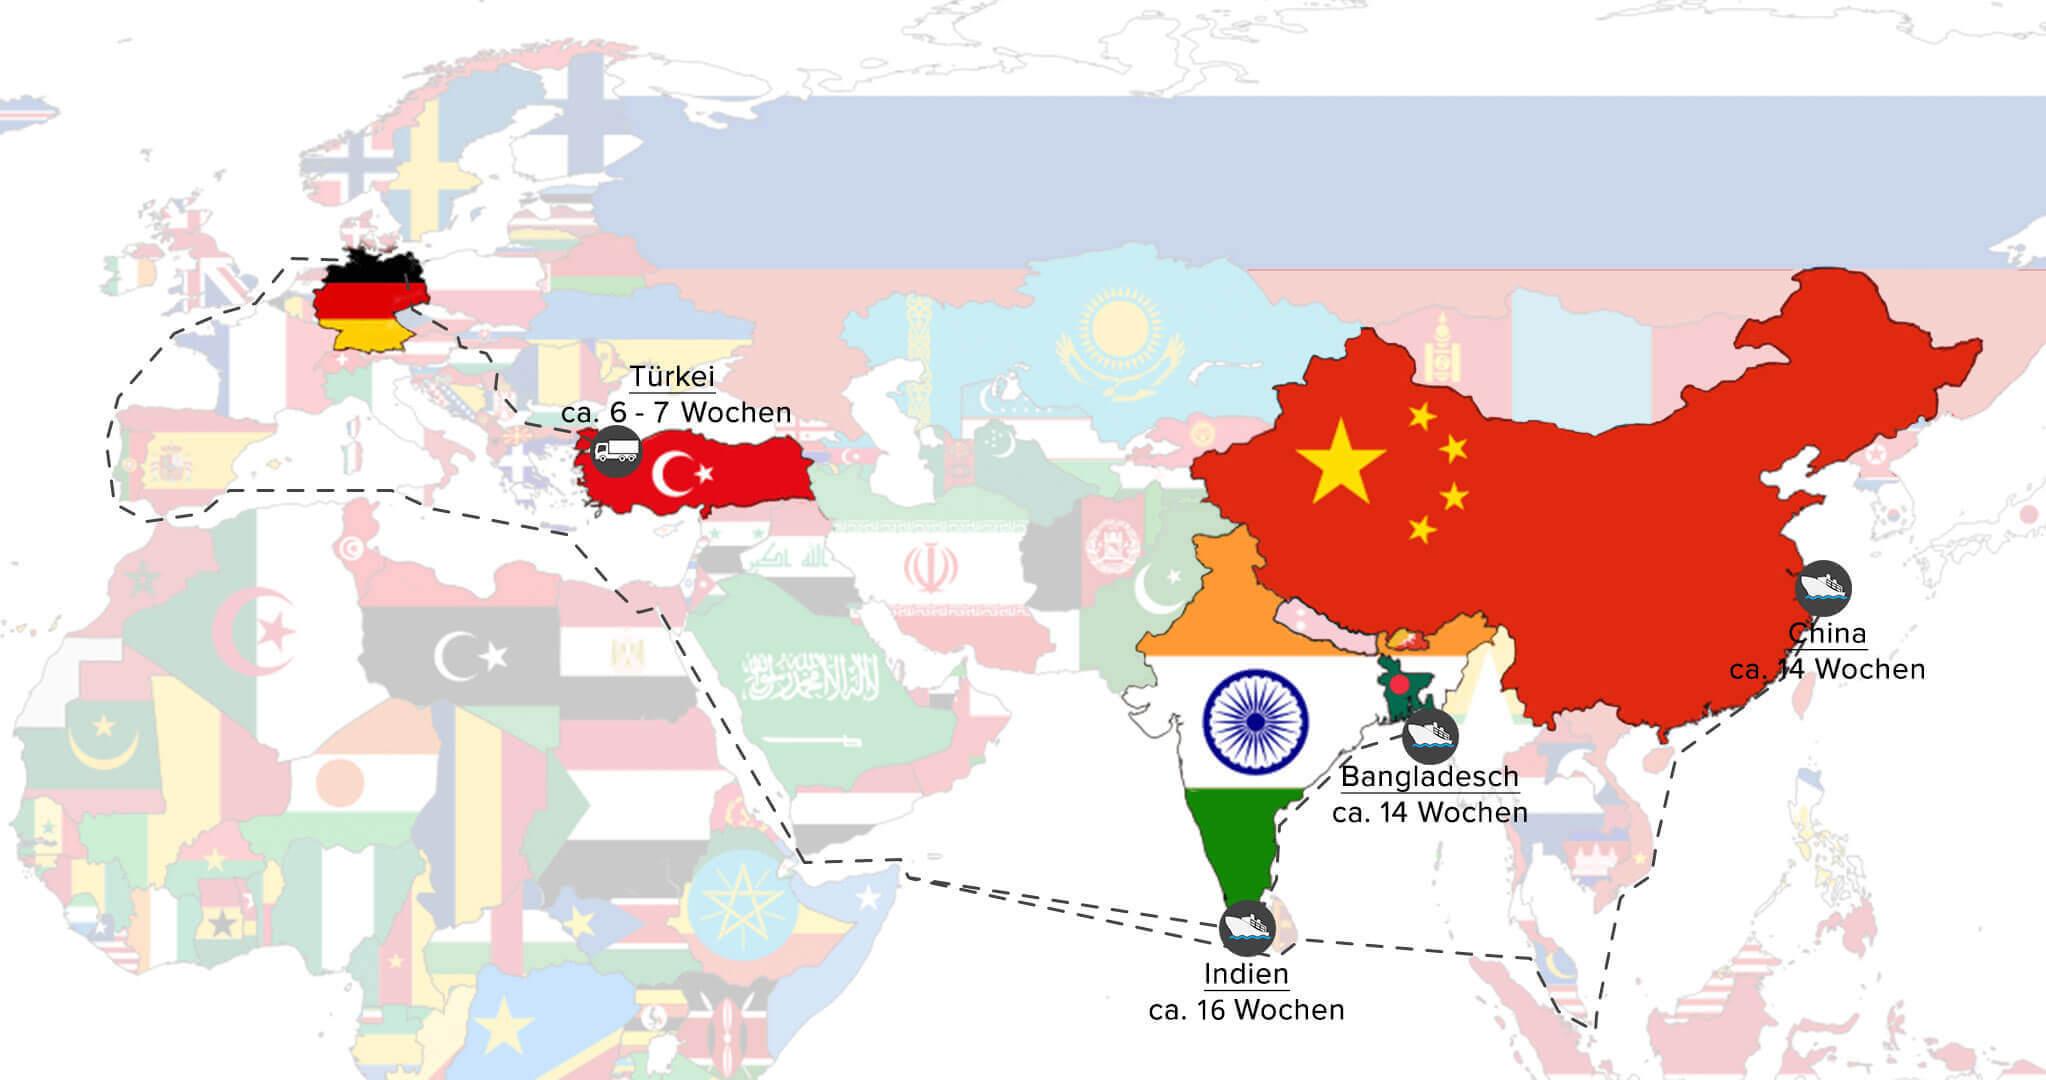 Textilhersteller-Shipping-Route-2020-2